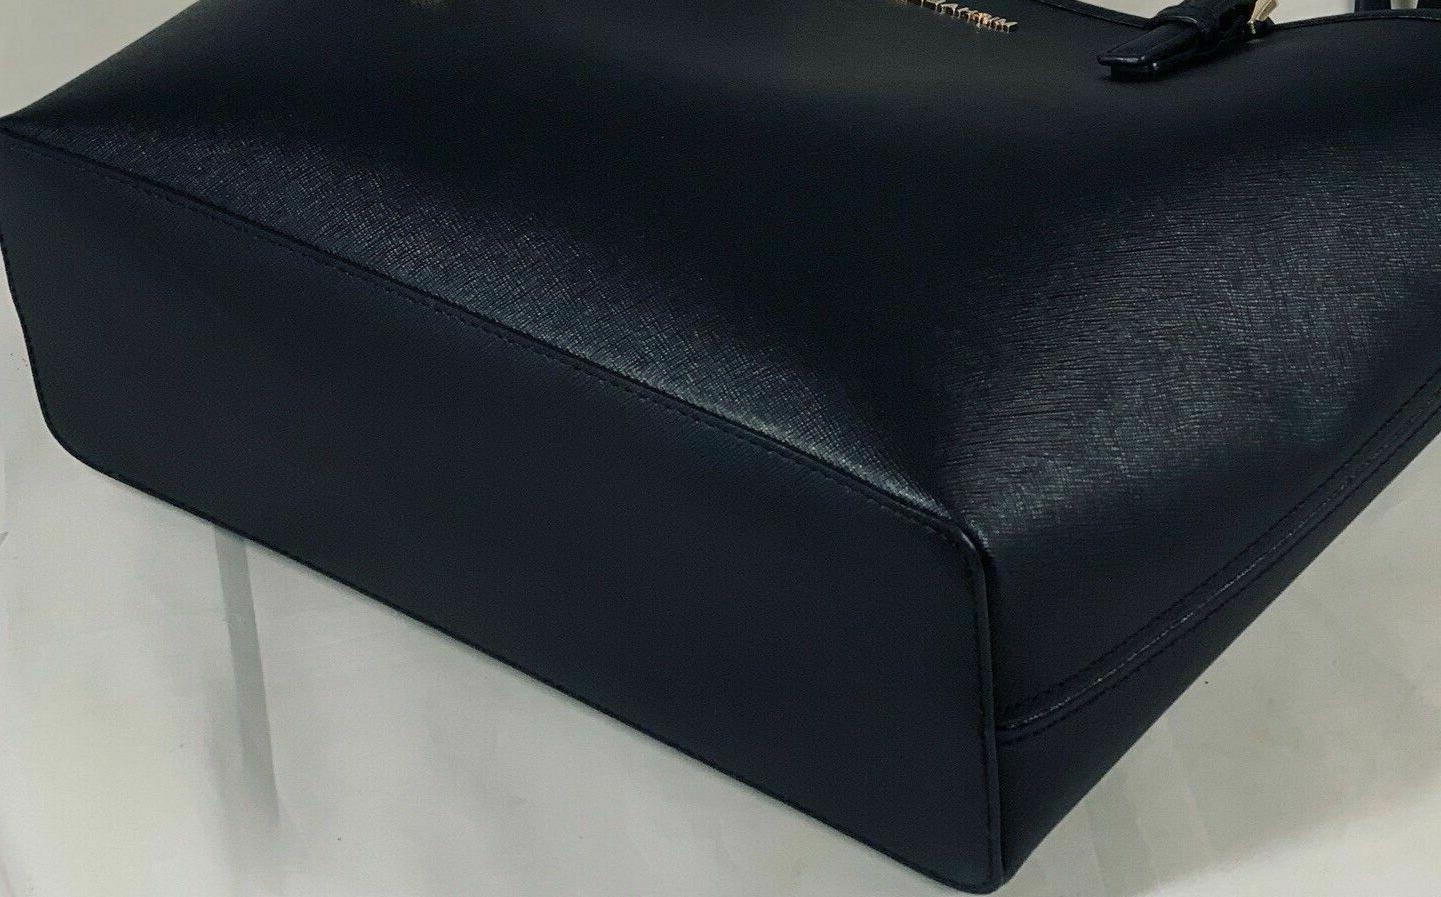 Michael Jet Set Travel Medium Saffiano Leather Carryall